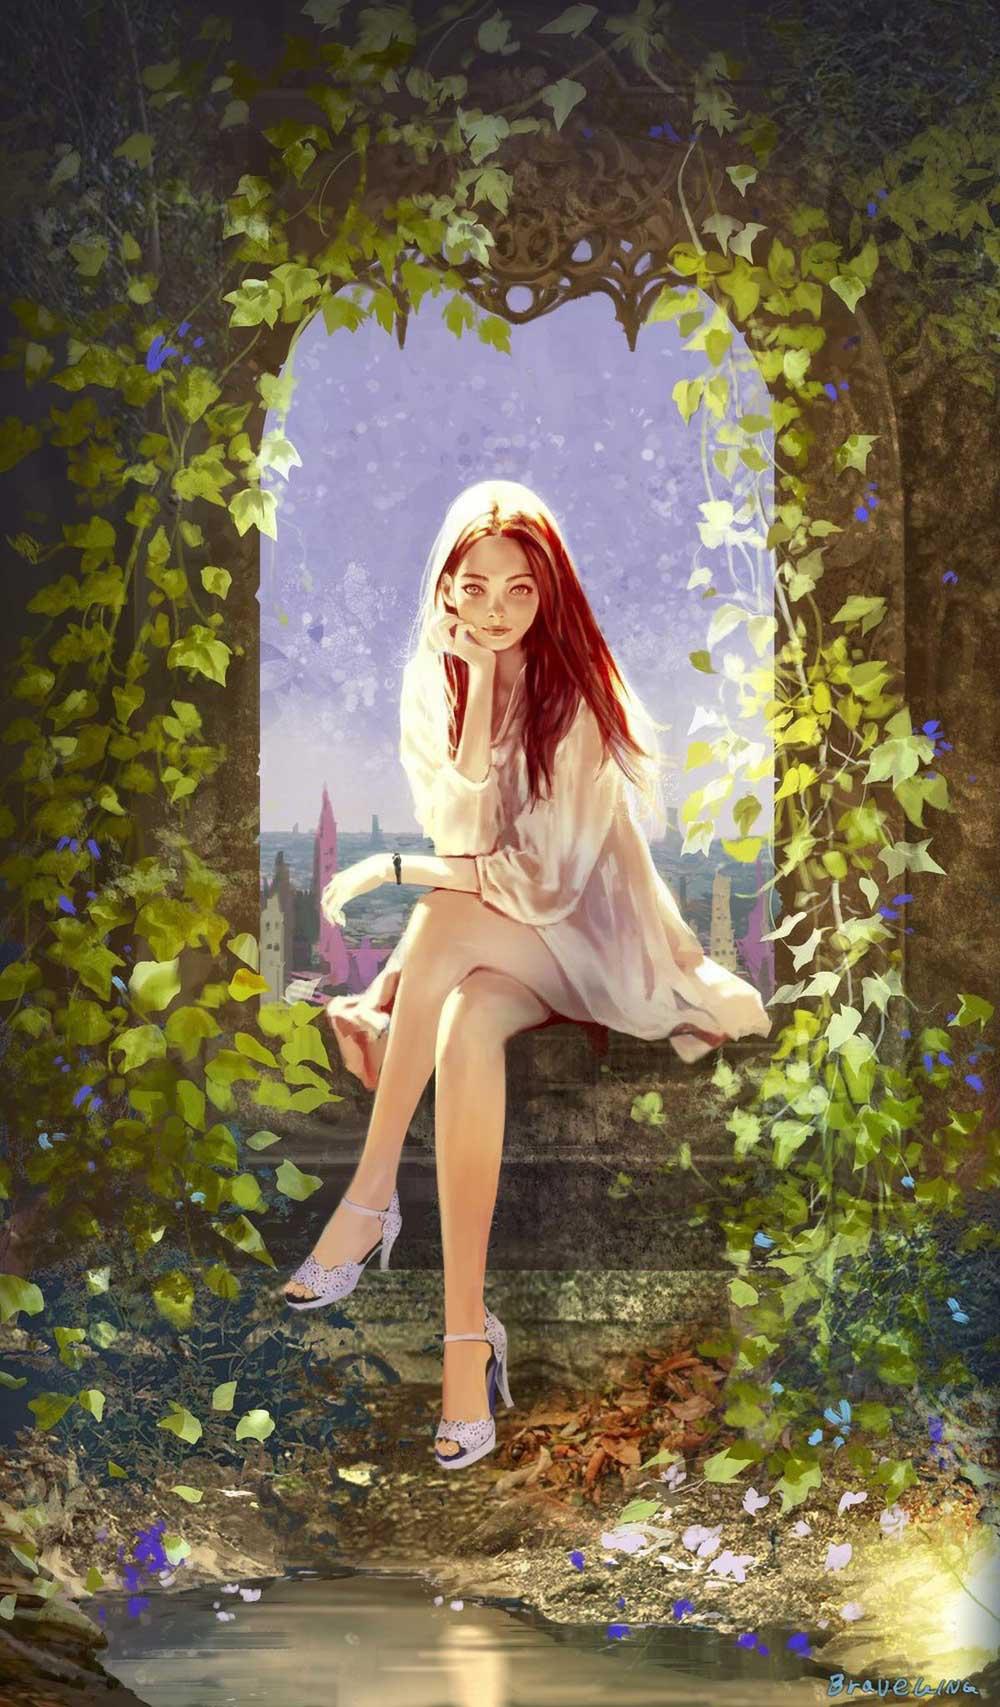 Inspirational Art : U by Sung Choul Ham